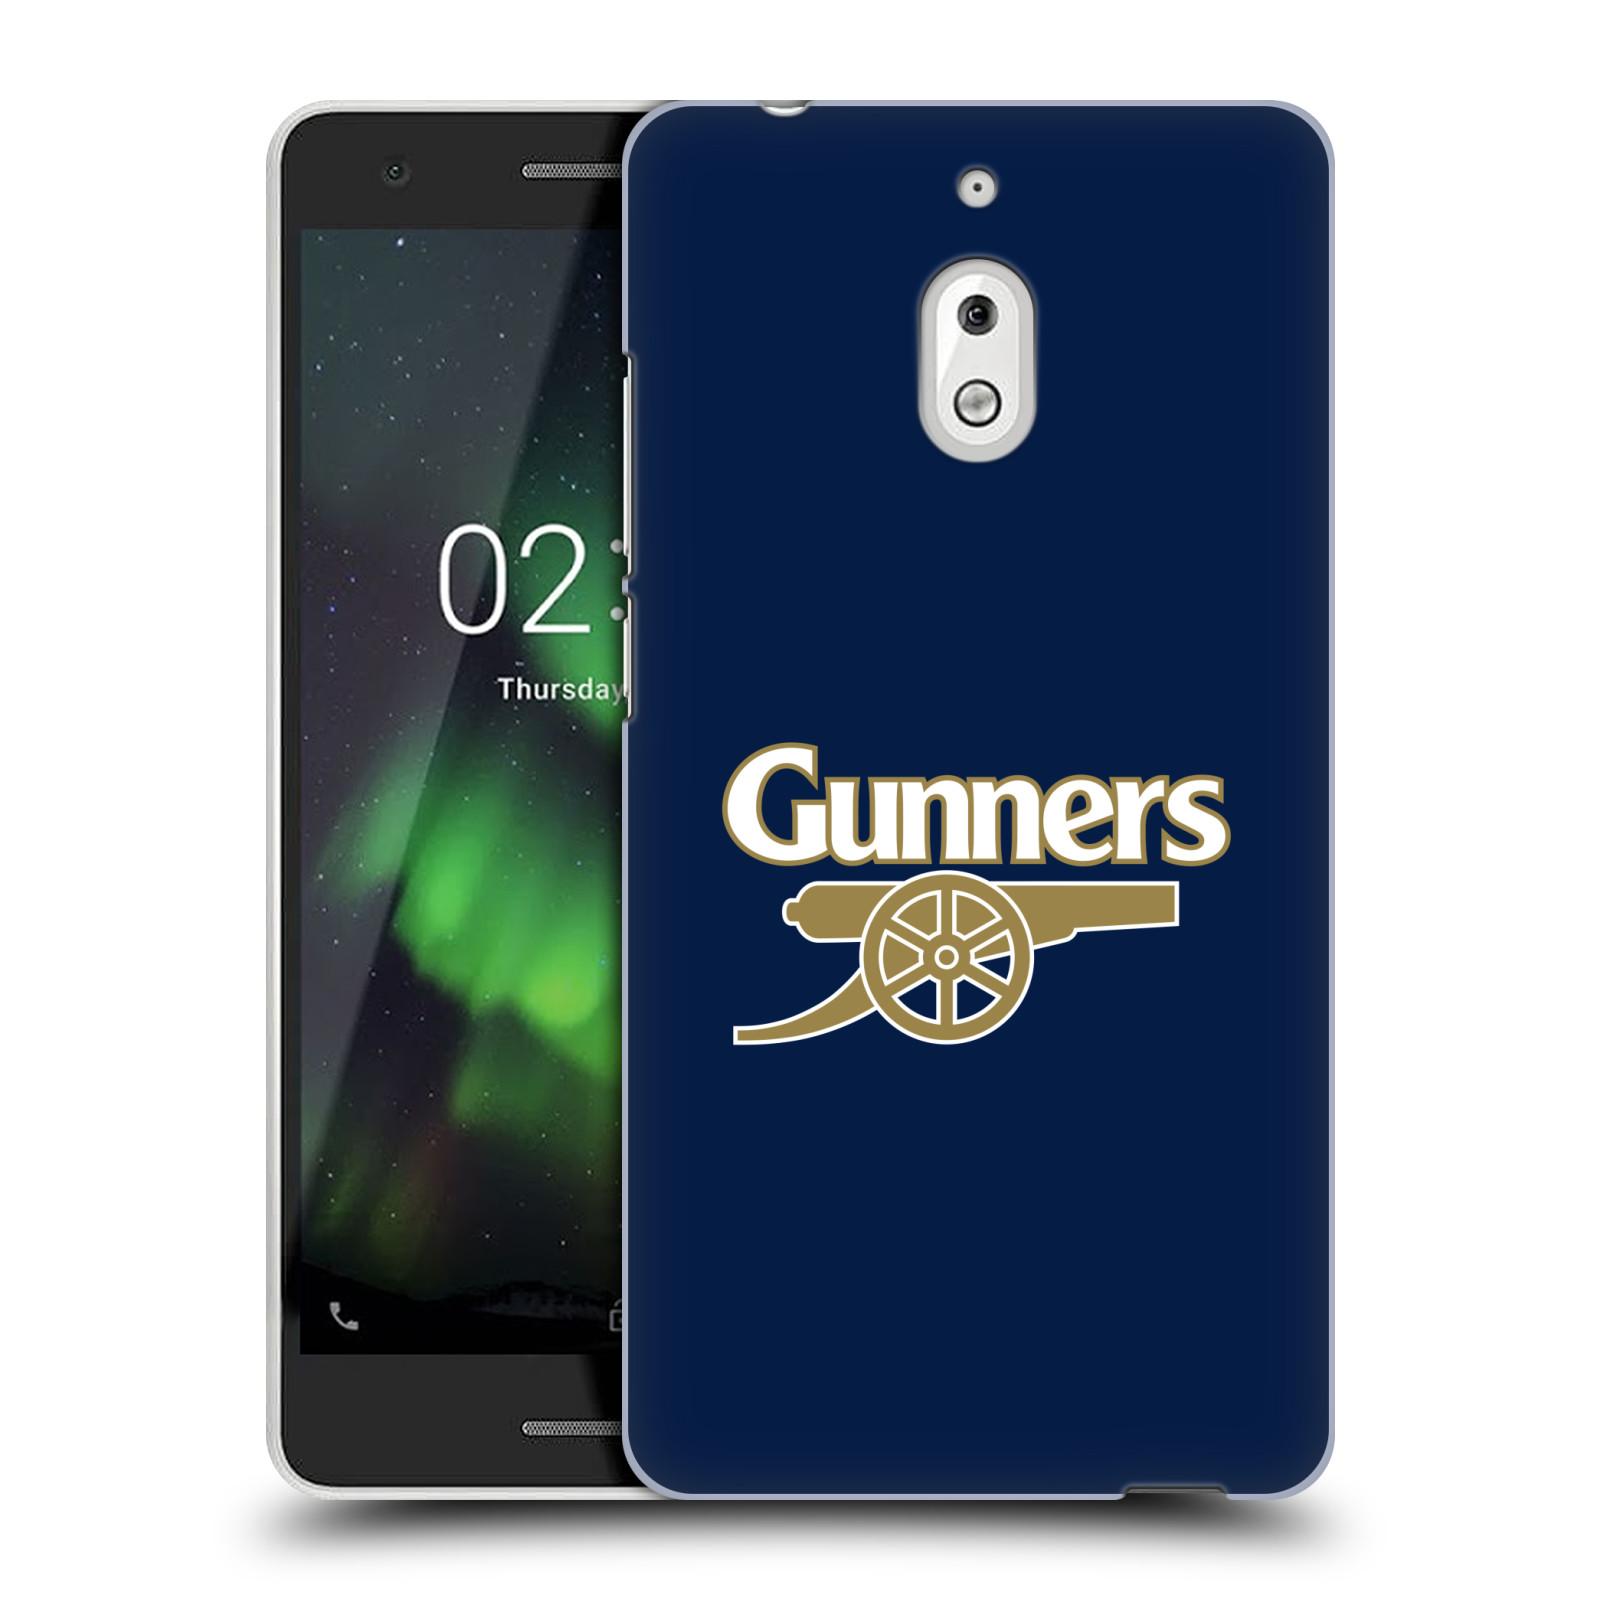 Plastové pouzdro na mobil Nokia 2.1 - Head Case - Arsenal FC - Gunners